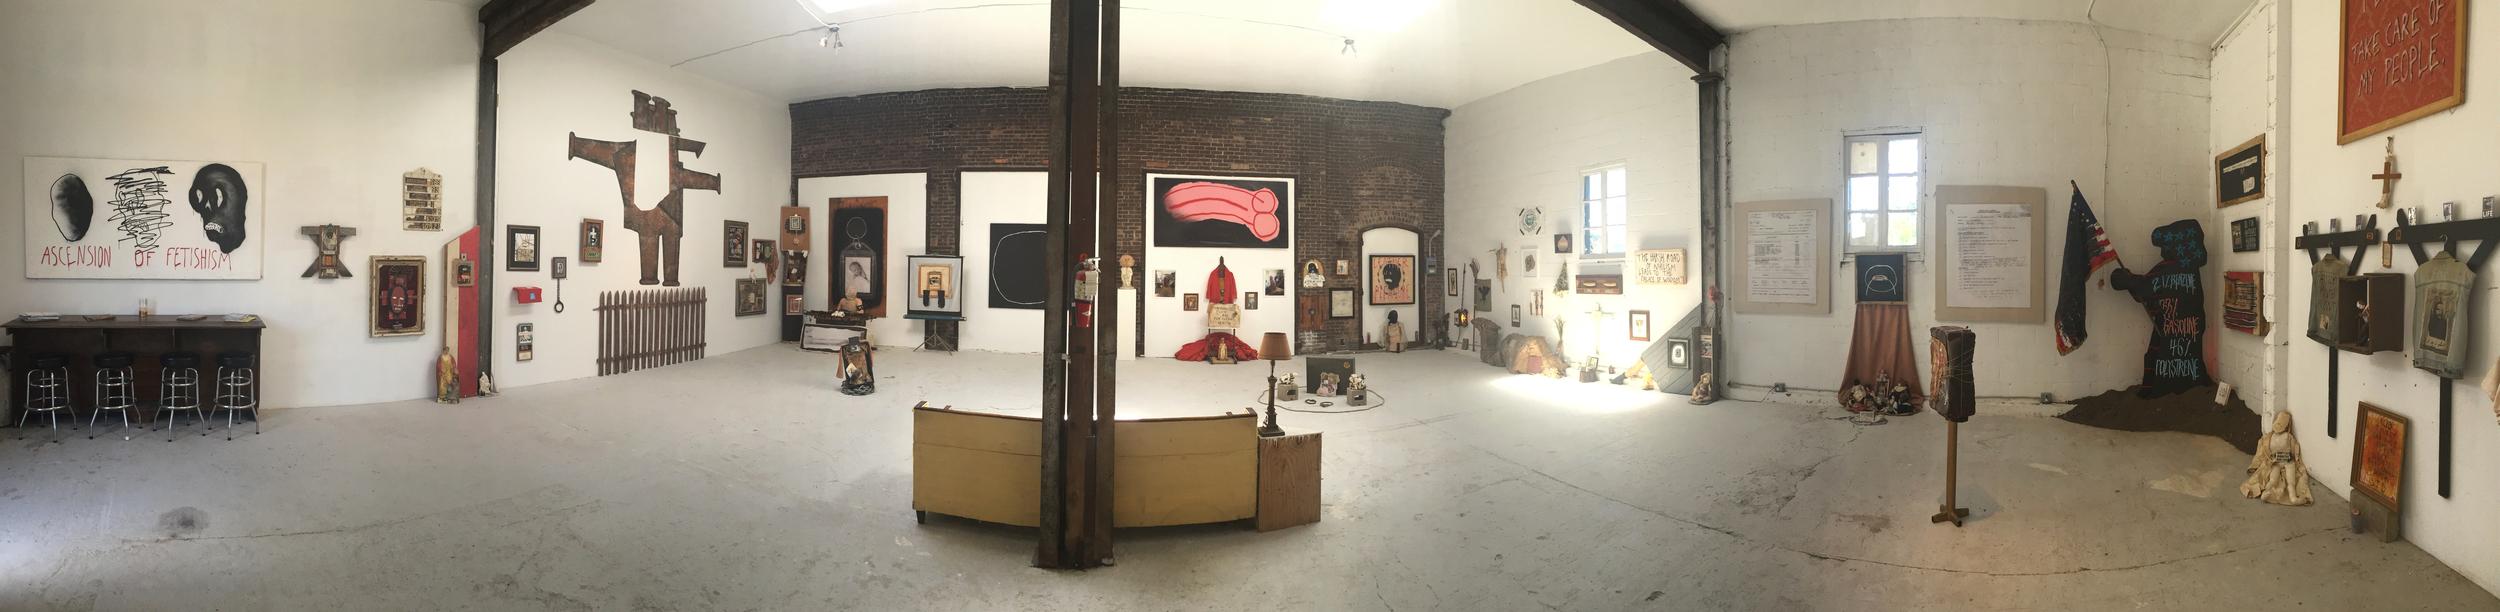 Full Gallery Pano.JPG